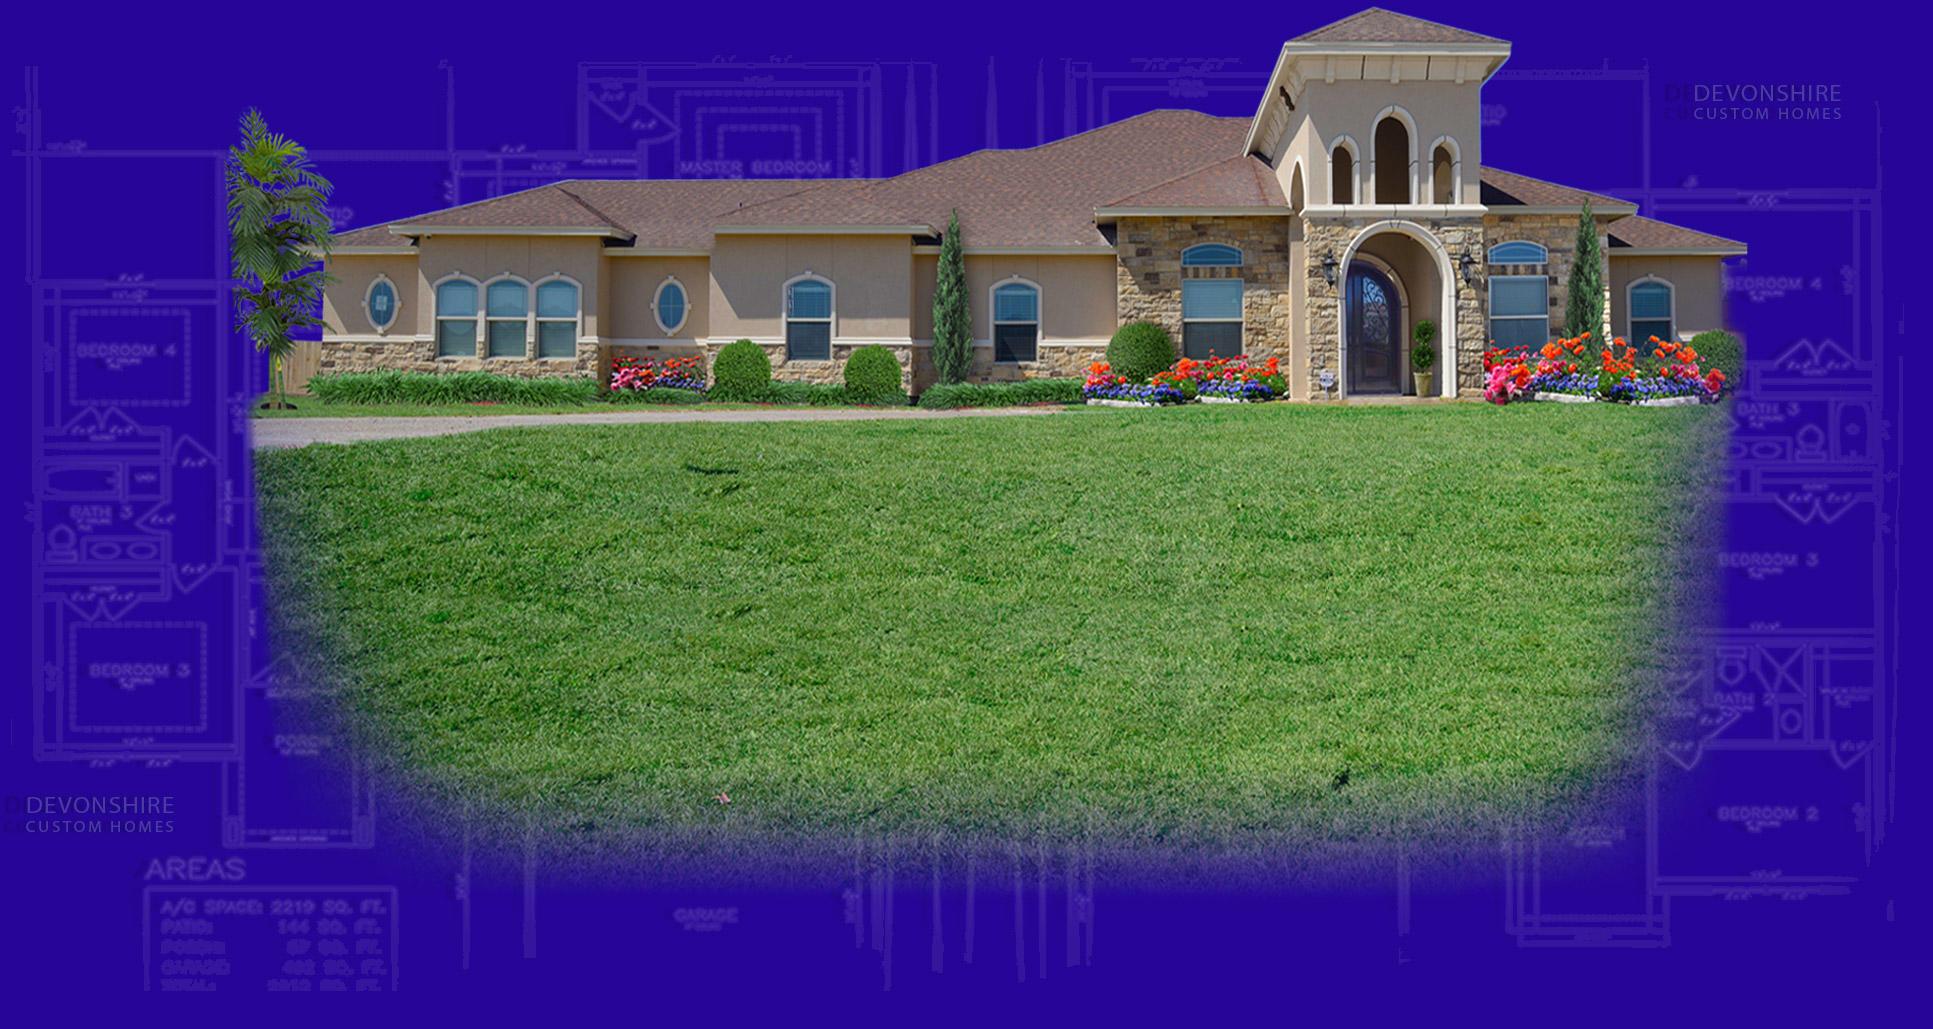 Devonshire Custom Homes image 6